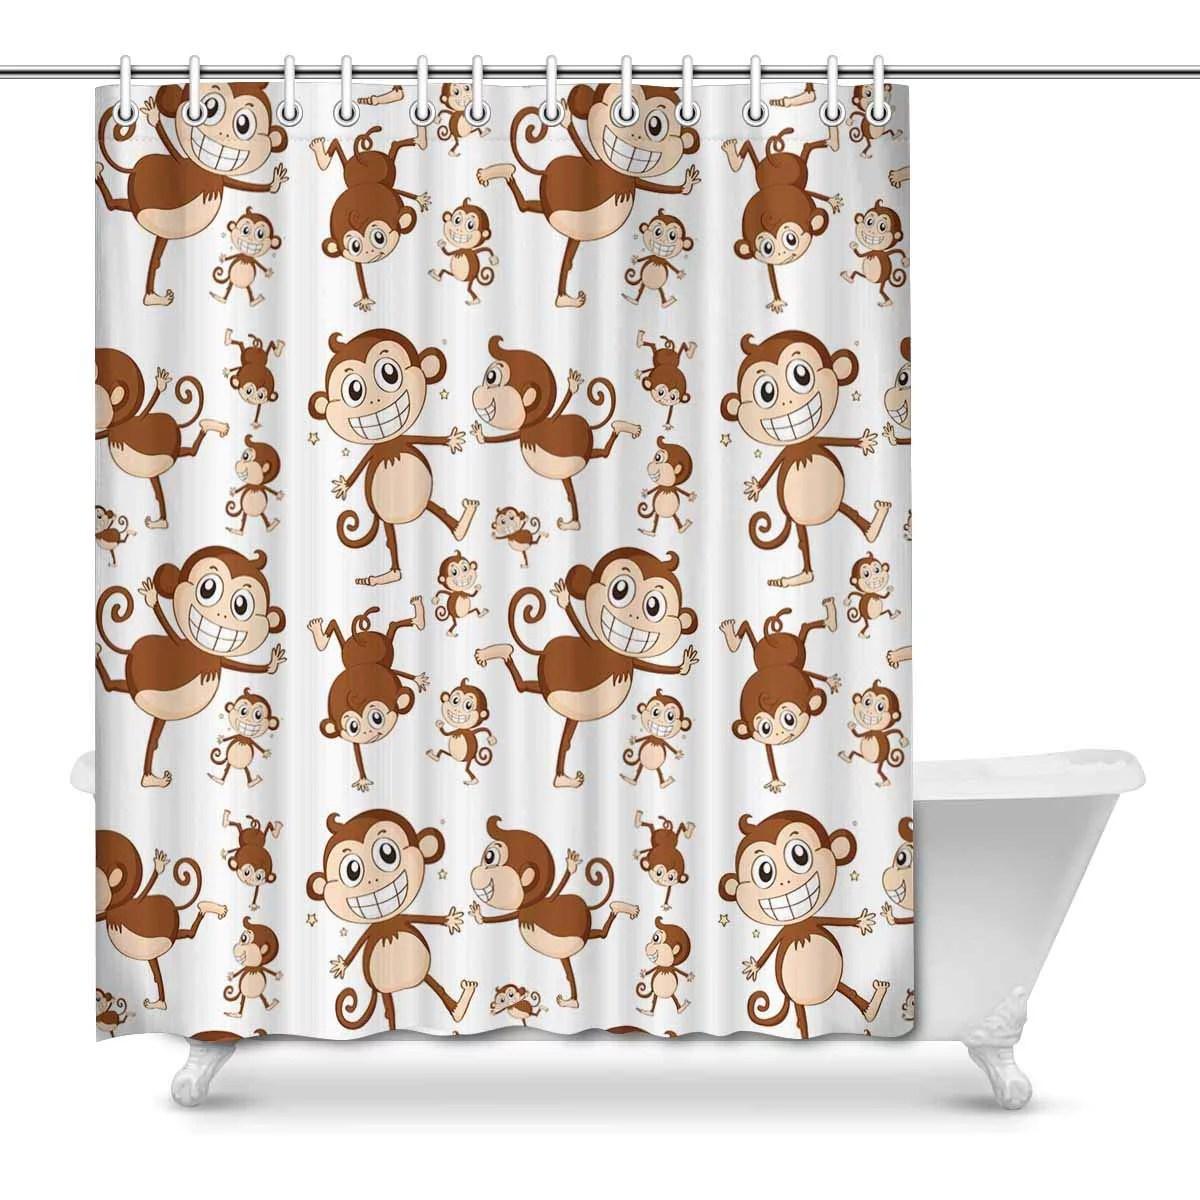 pop monkey shower curtain bathroom sets home decor 66x72 inch